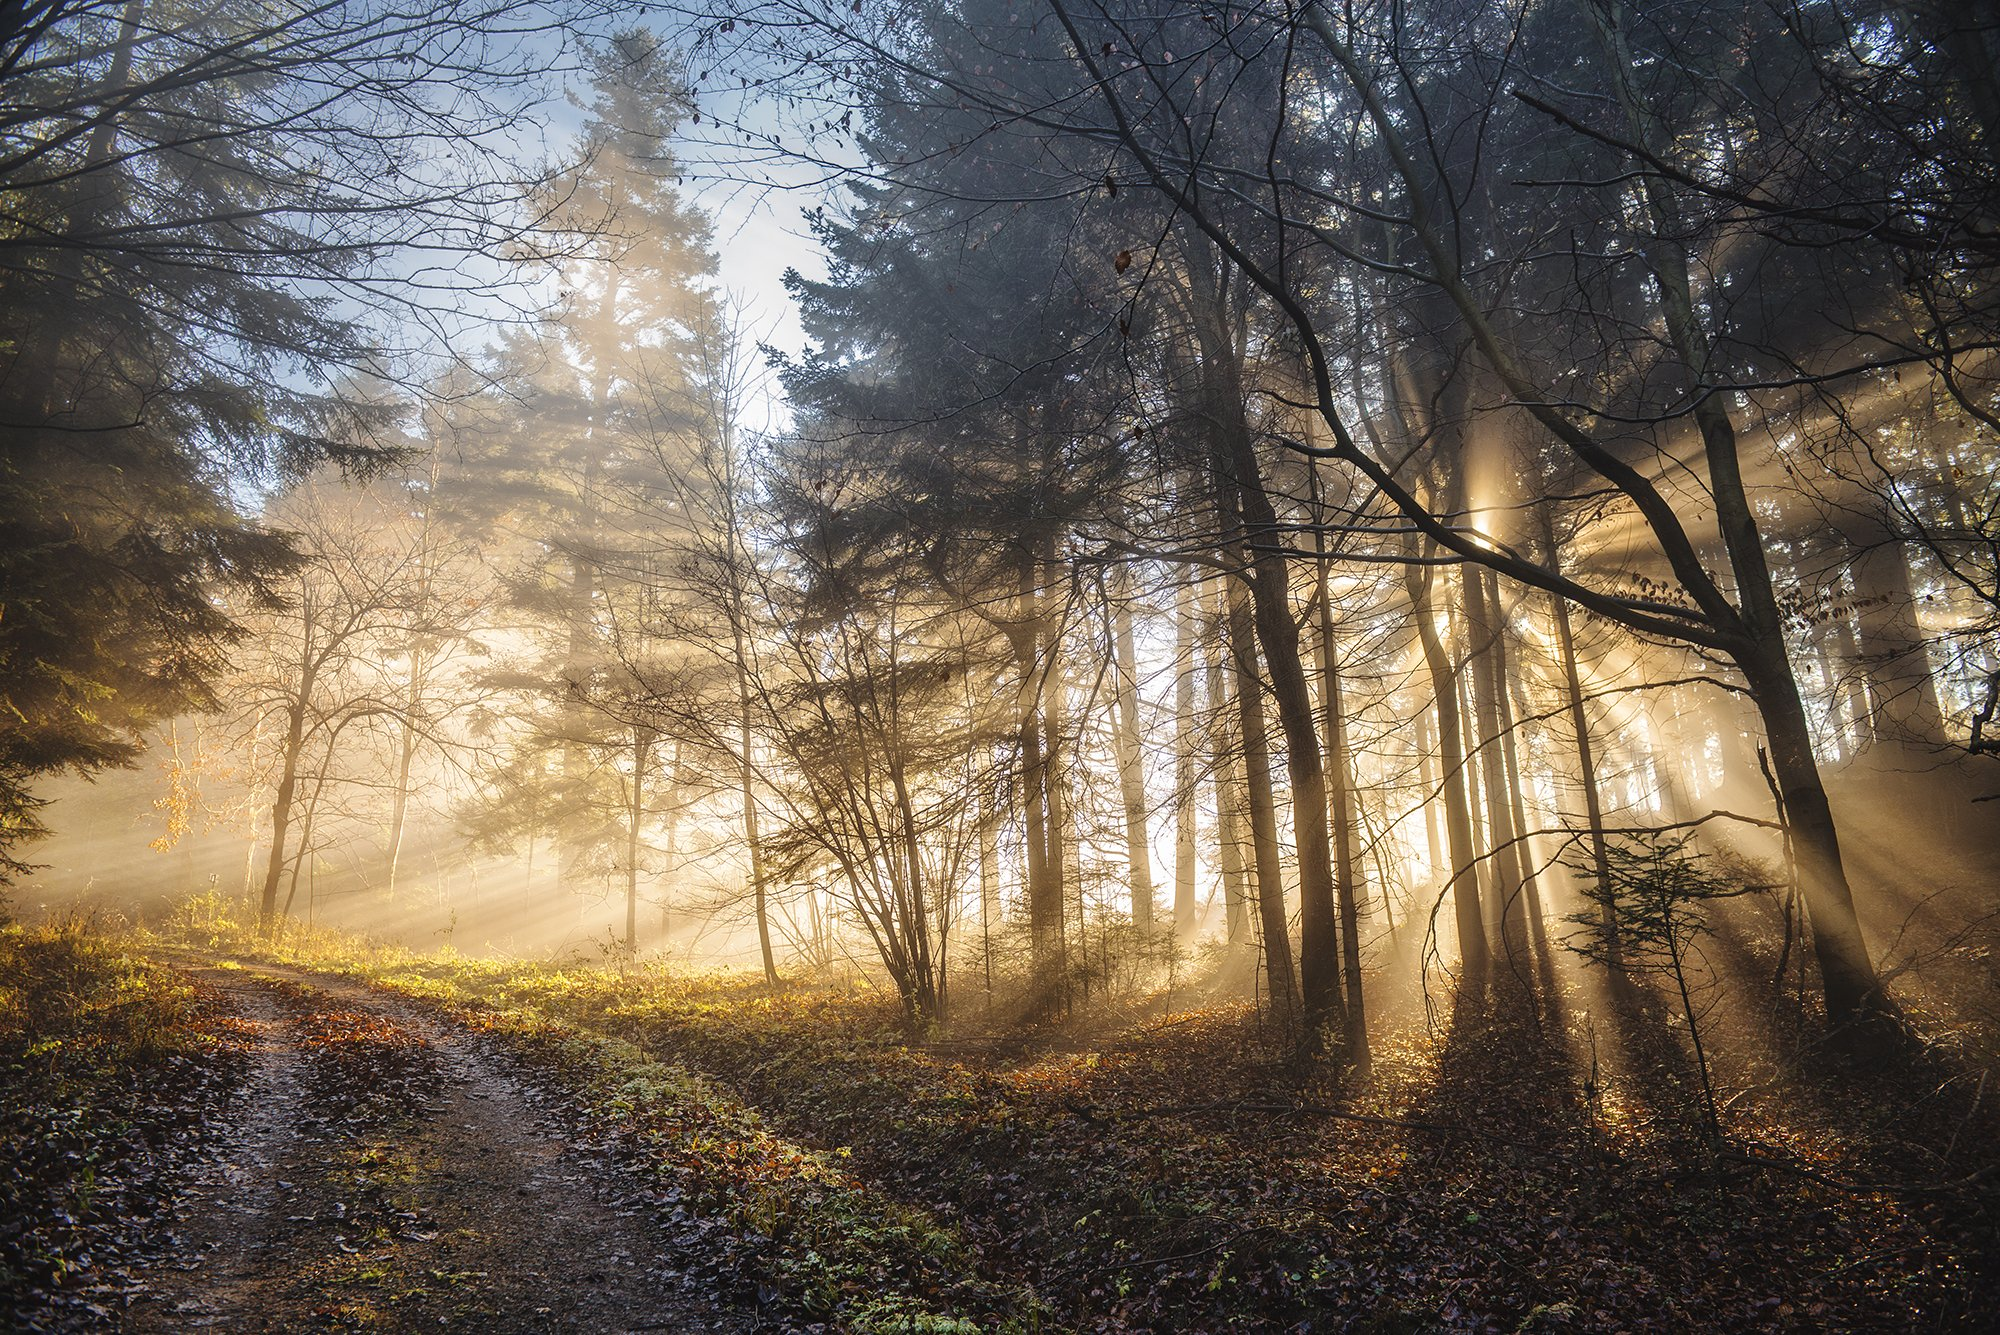 mountains, poland, slovakia, tatry, pieniny, light, sunrise, sun, light, landscape, autumn, warm, colors, fall, forest, wood, trees, Bieganski Patryk